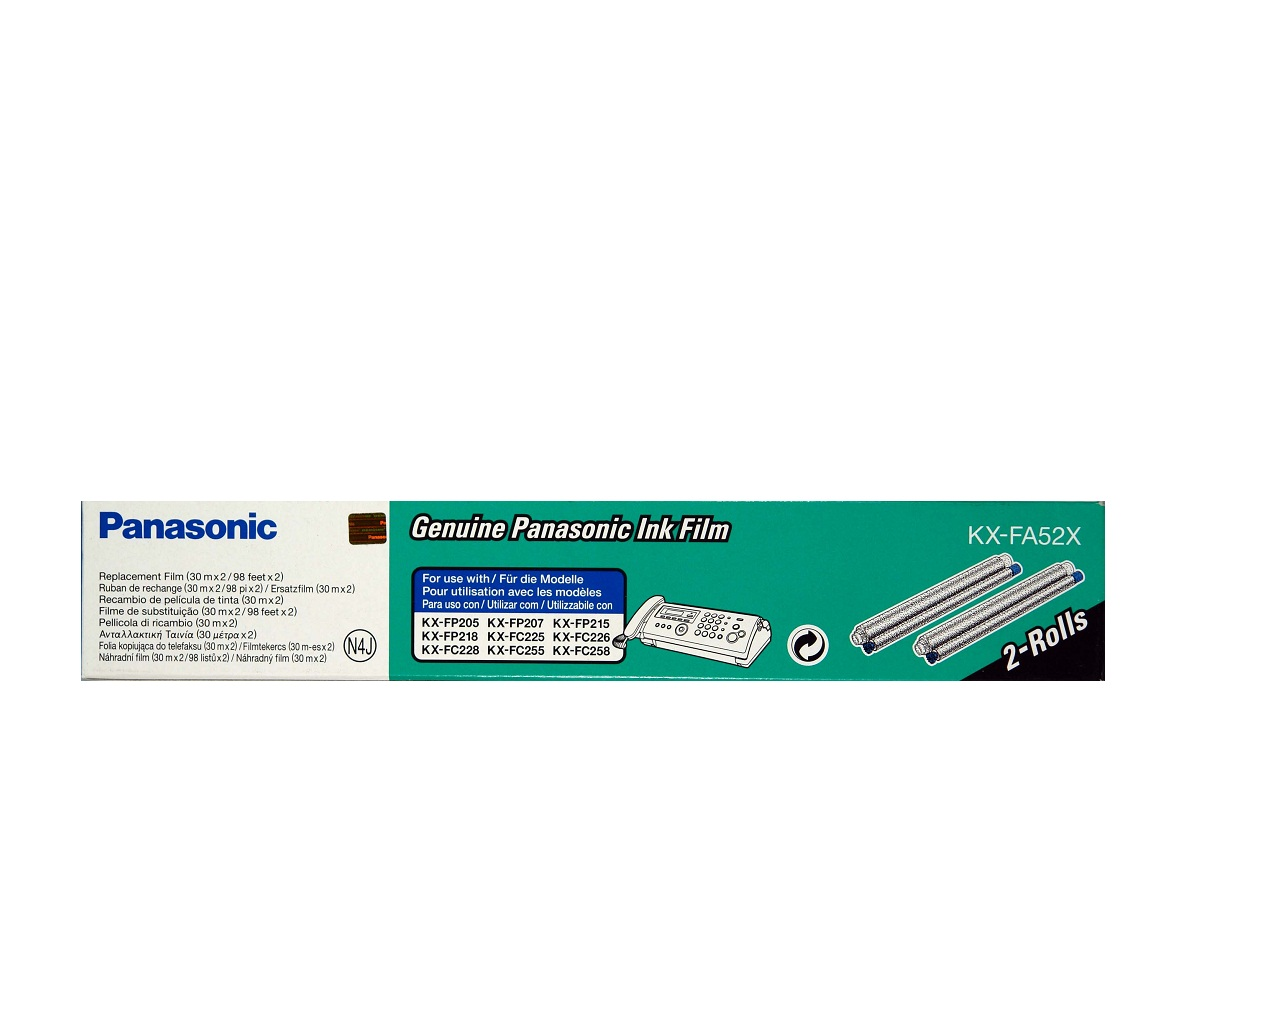 PANASONIC KX-FA52X FAX KXFP205/225/255 (2X30M)